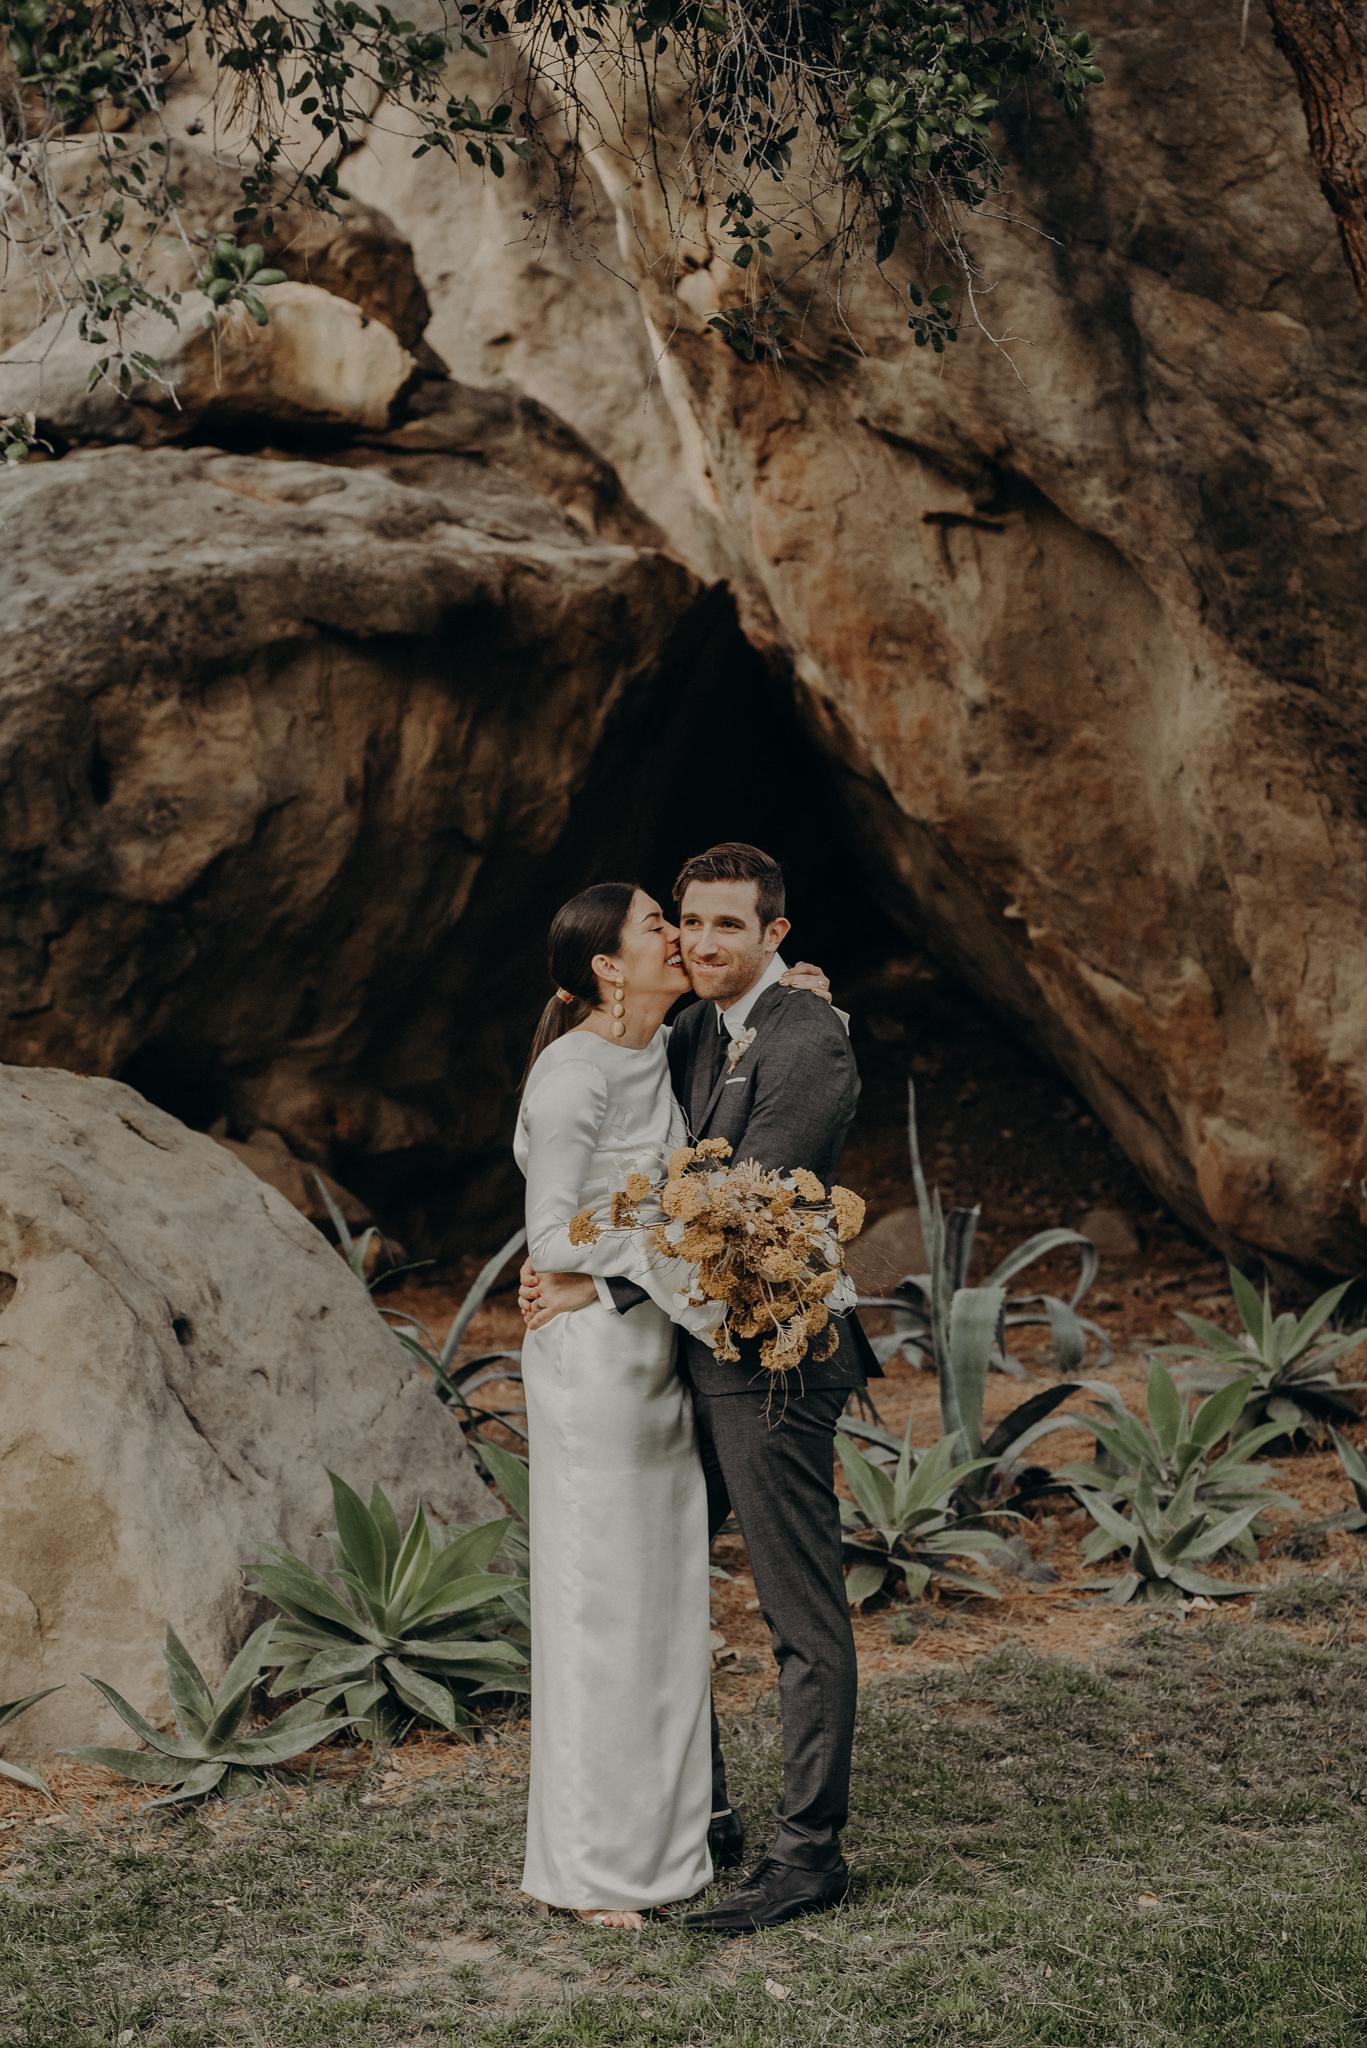 Hummingbird Nest Ranch Wedding - Wedding Photographer in Los Angeles - IsaiahAndTaylor.com-057.jpg